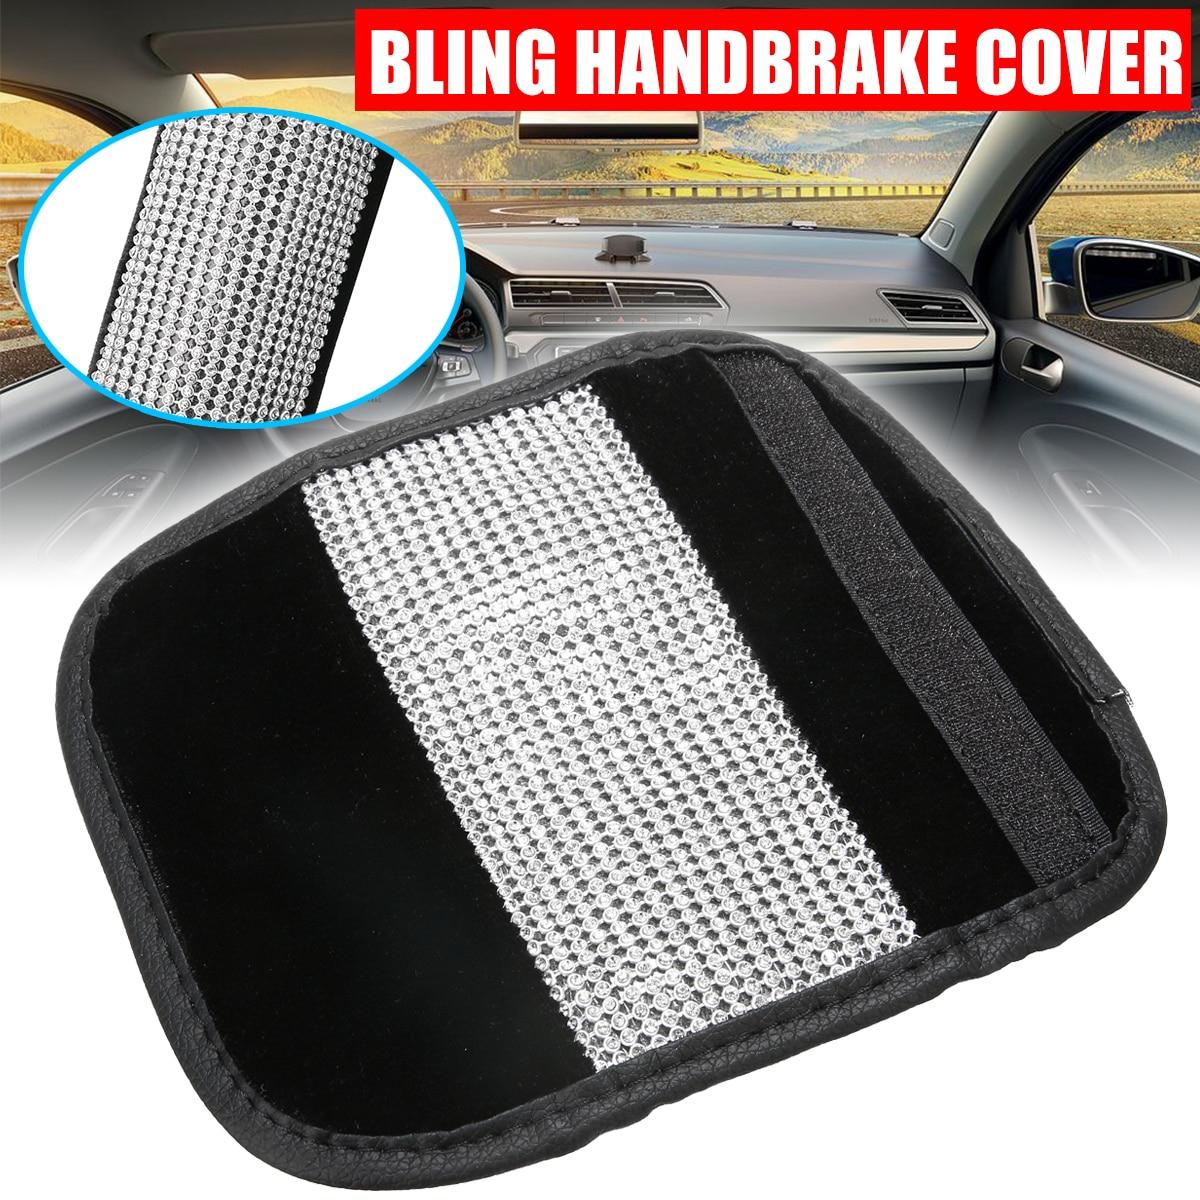 Mayitr 1pc Bling Rhinestone Crystal PU Leather Car Handbrake Hand Brake Decor Cover Auto DIY